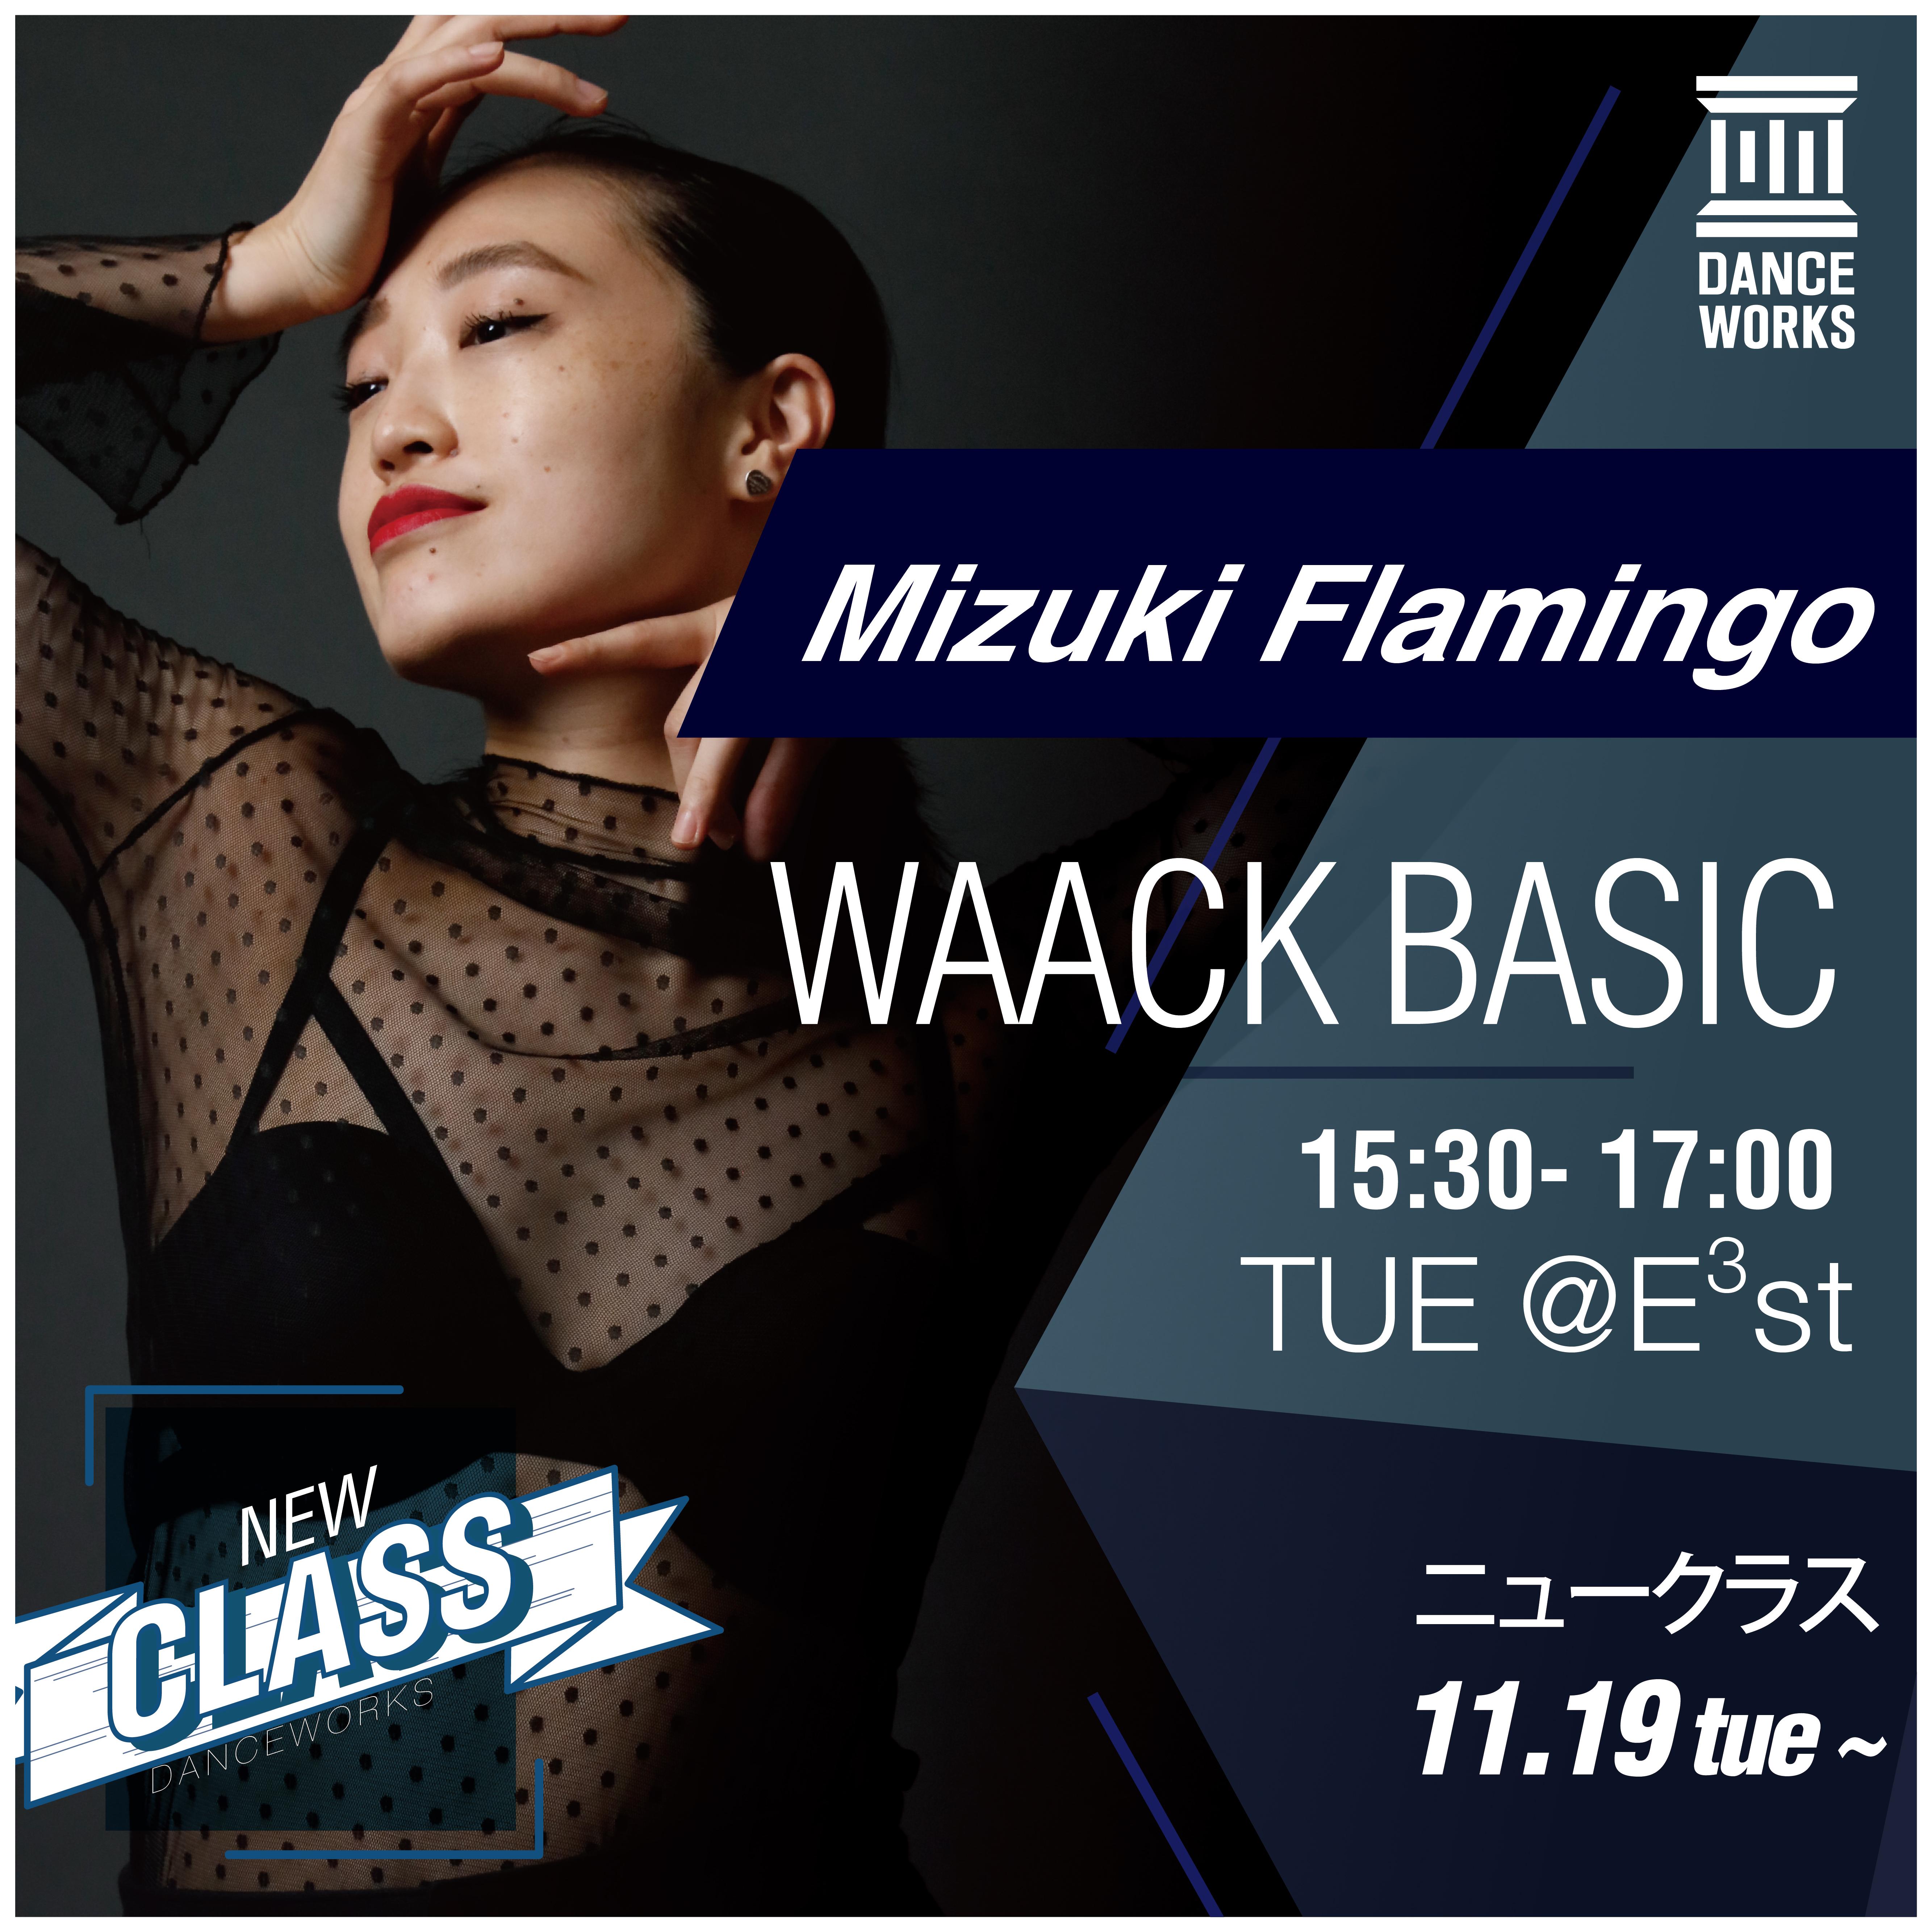 Dance Works、Mizuki Flamingo氏による「WAACK BASIC」クラスを開講<